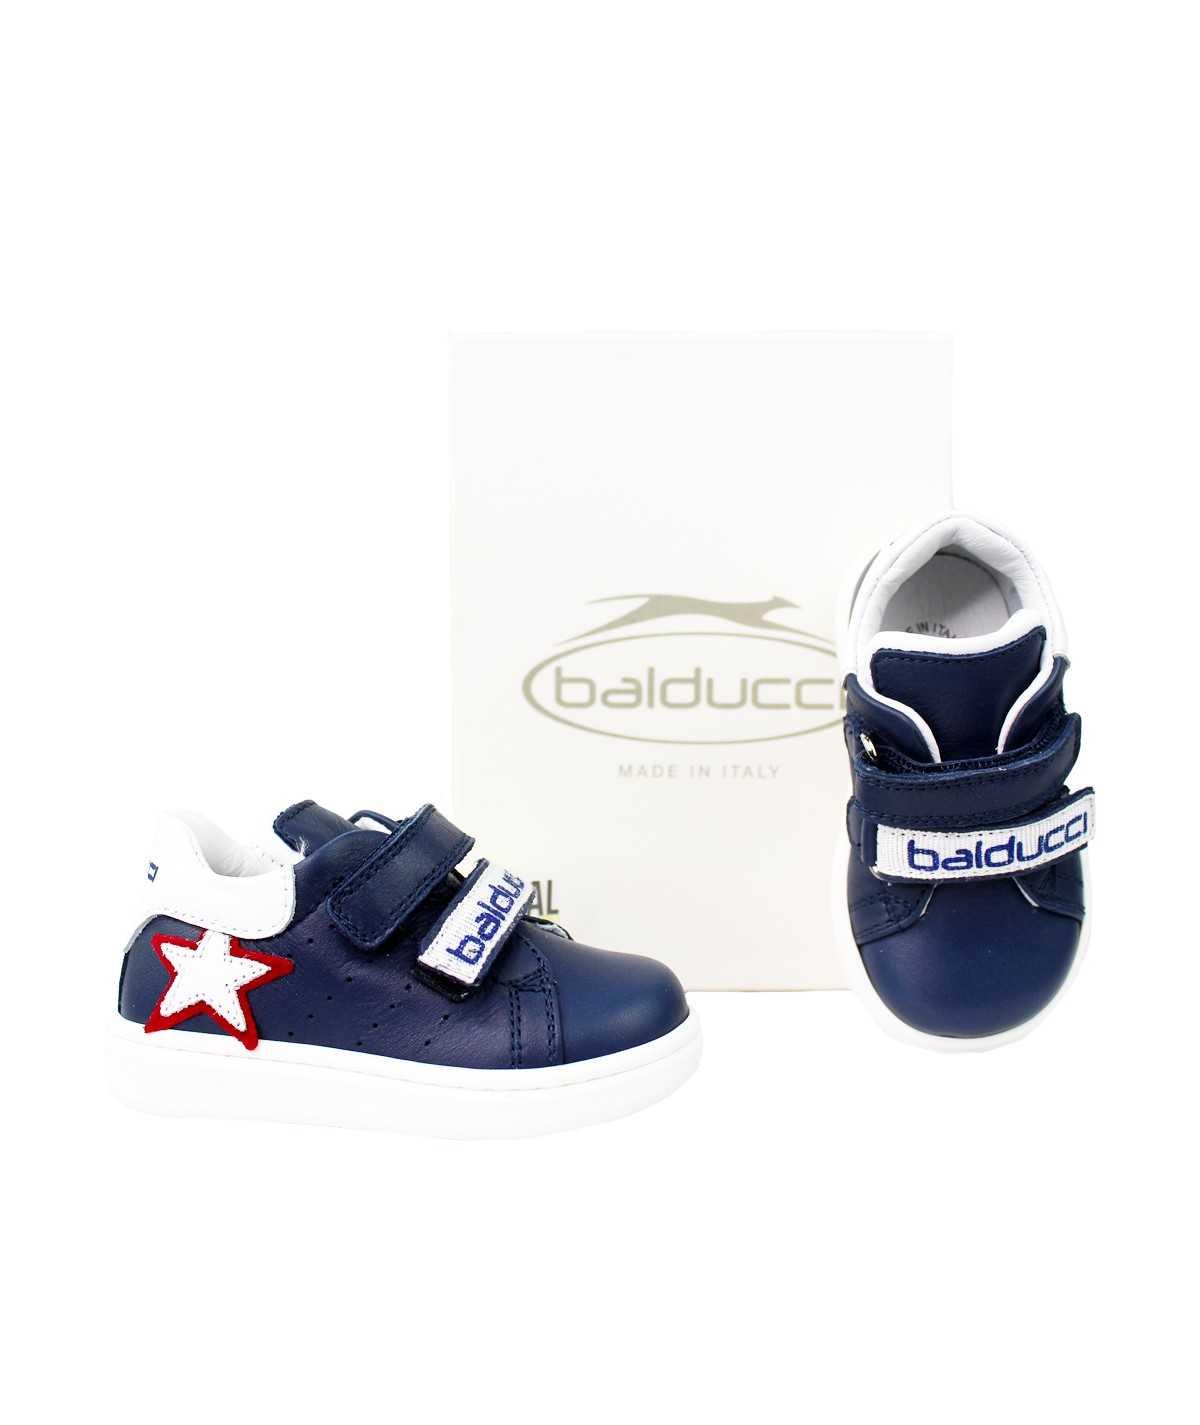 BALDUCCI Sneakers Bimbo 18/25